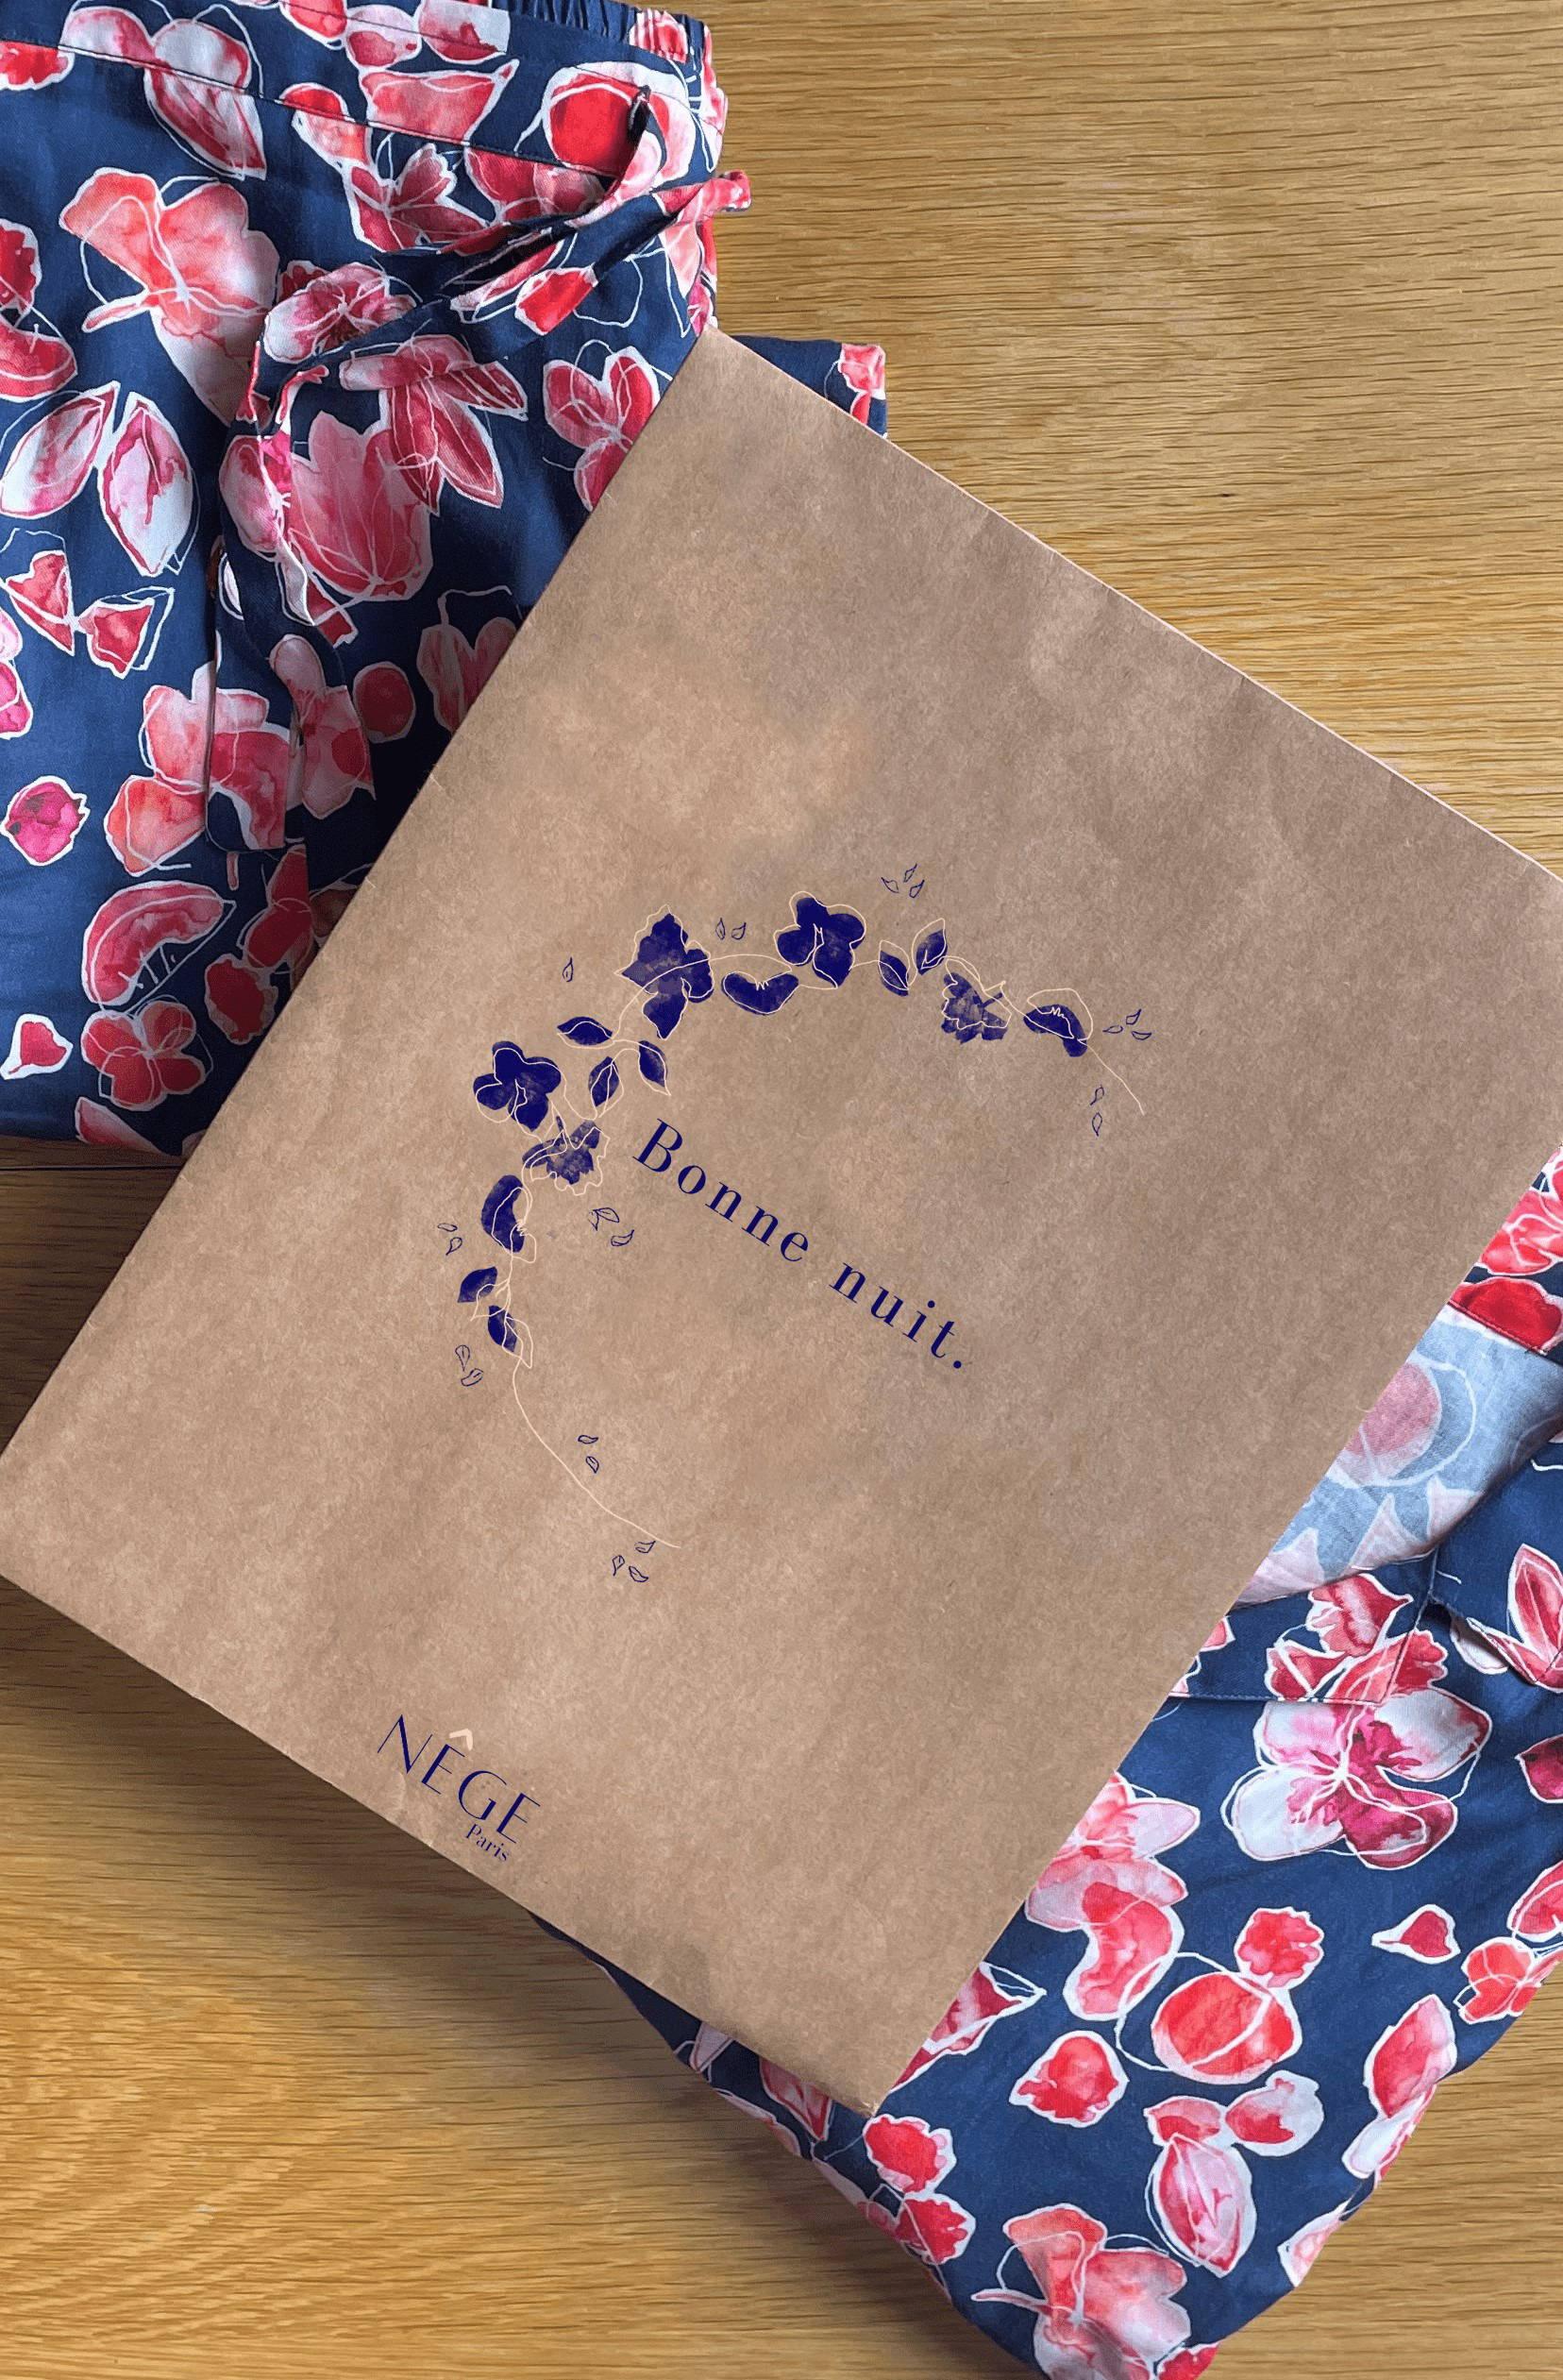 Nêge Paris - Notre enveloppe minimaliste qui emballe vos pyjamas